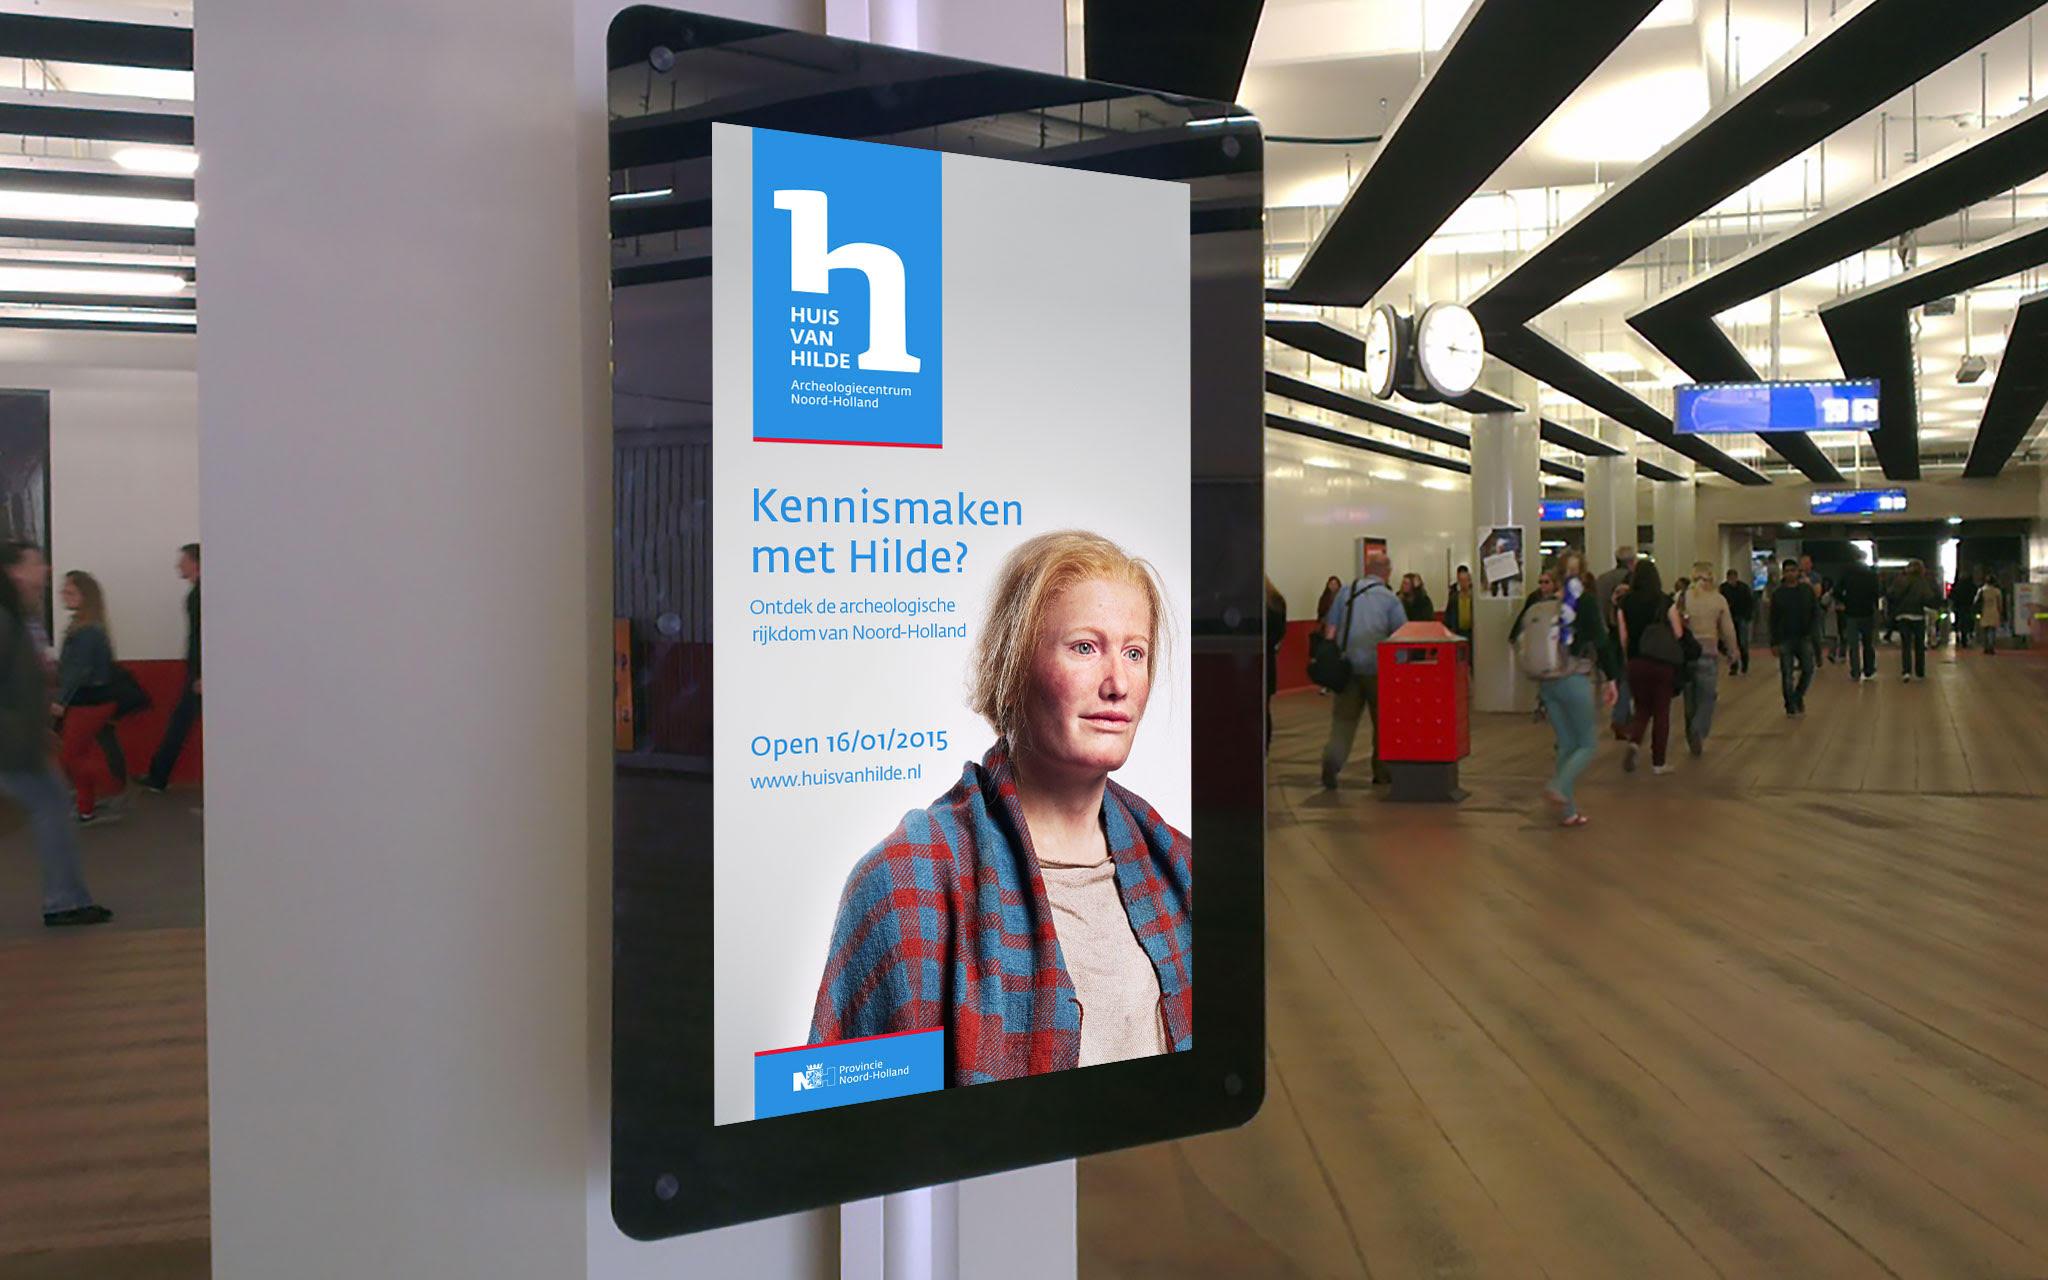 Huis van Hilde reclamebord Amsterdam centraal